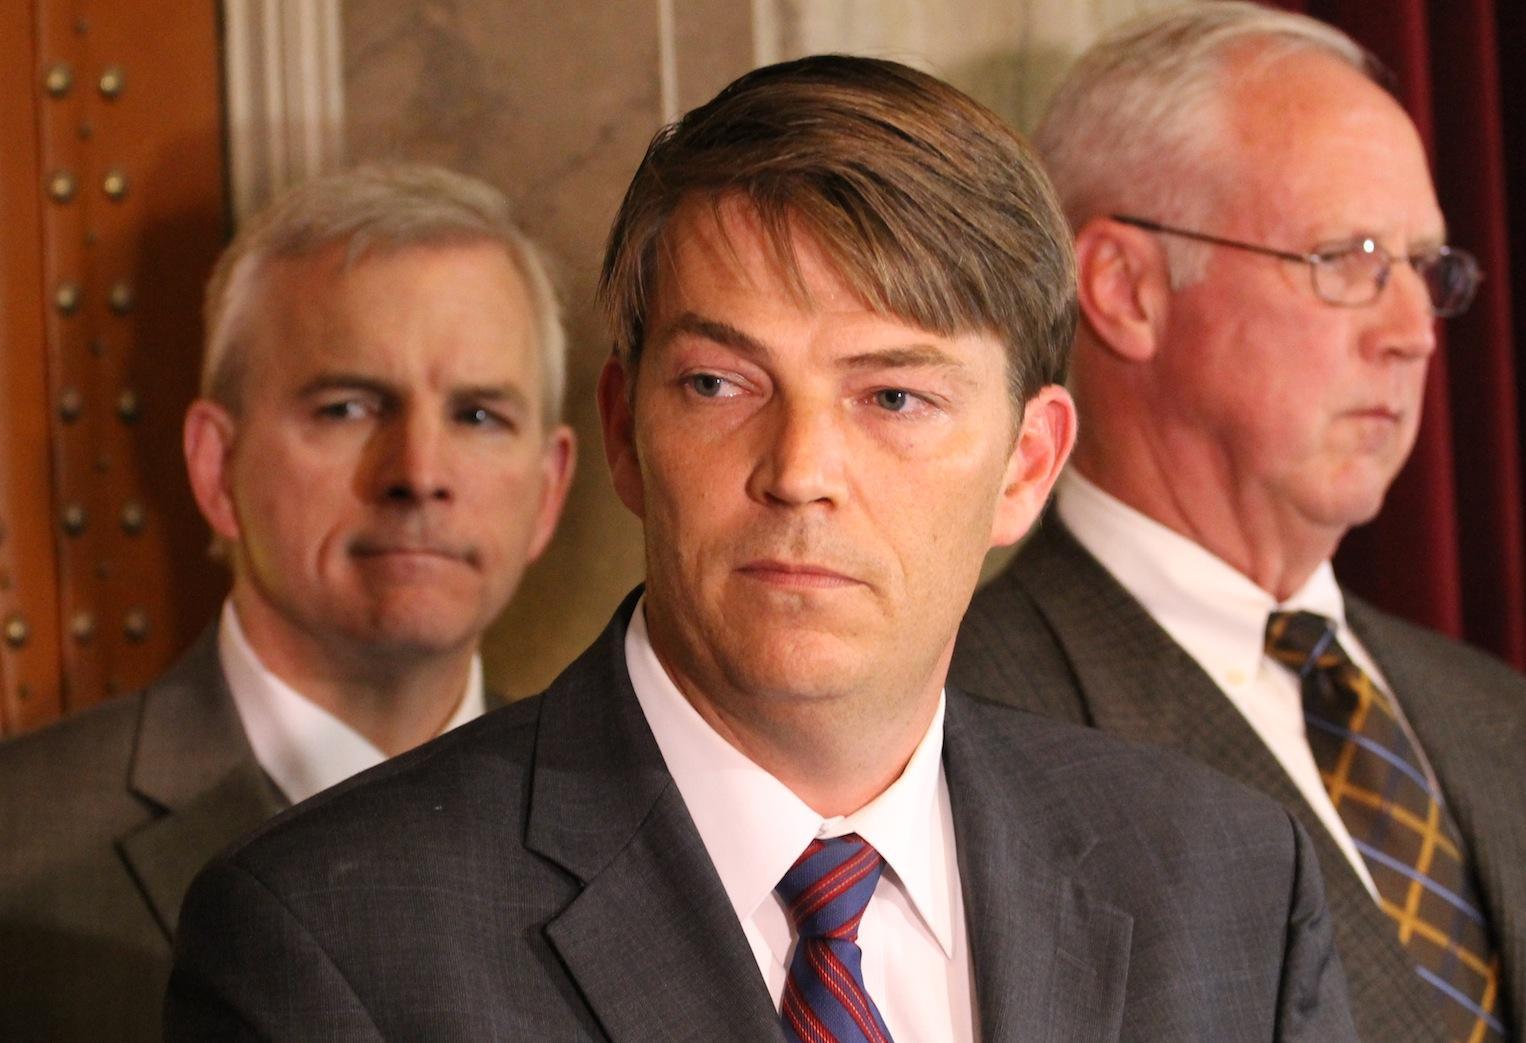 richardson takes over after scandal topples missouri house speaker